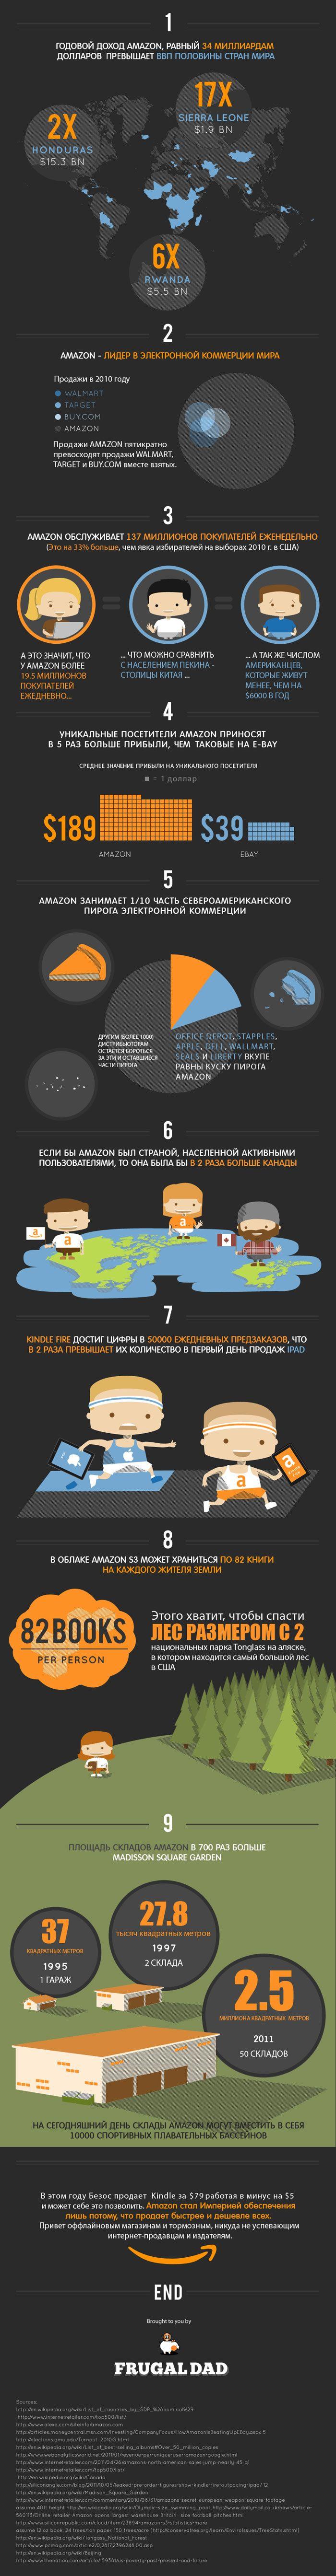 "Факты об интернет-магазине ""Amazon"" (инфографик)"